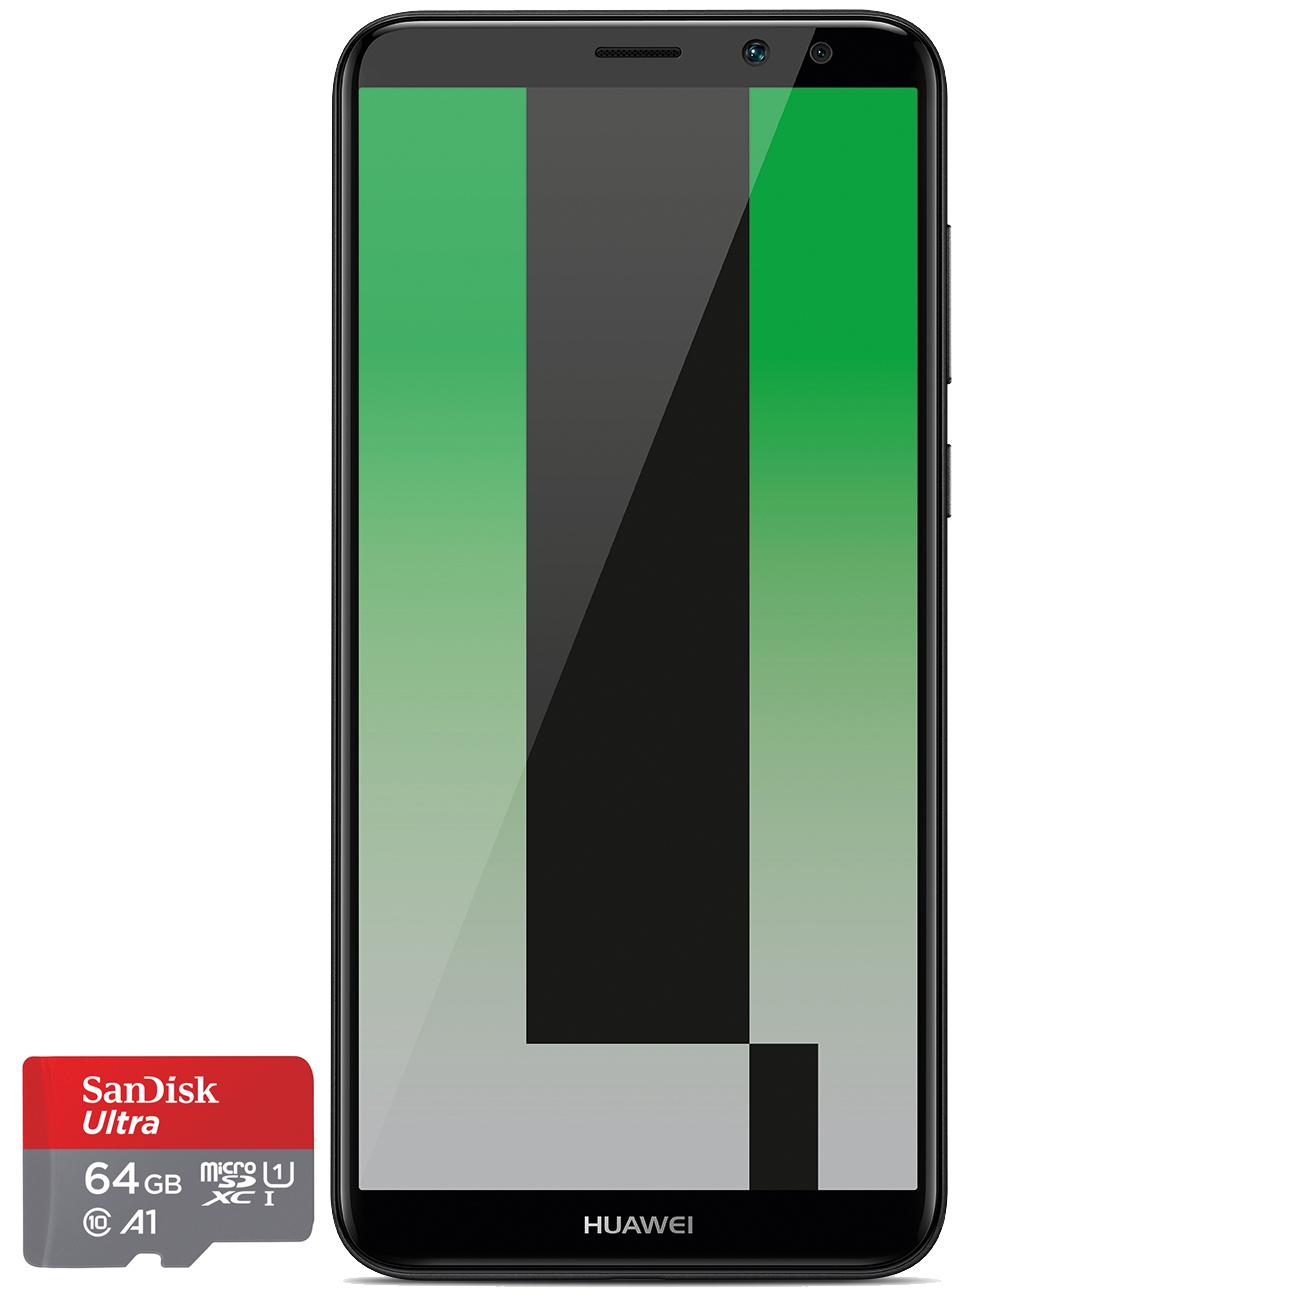 Huawei Mate 10 Lite Schwarz 64gb + MicroSD Karte für 296,65€